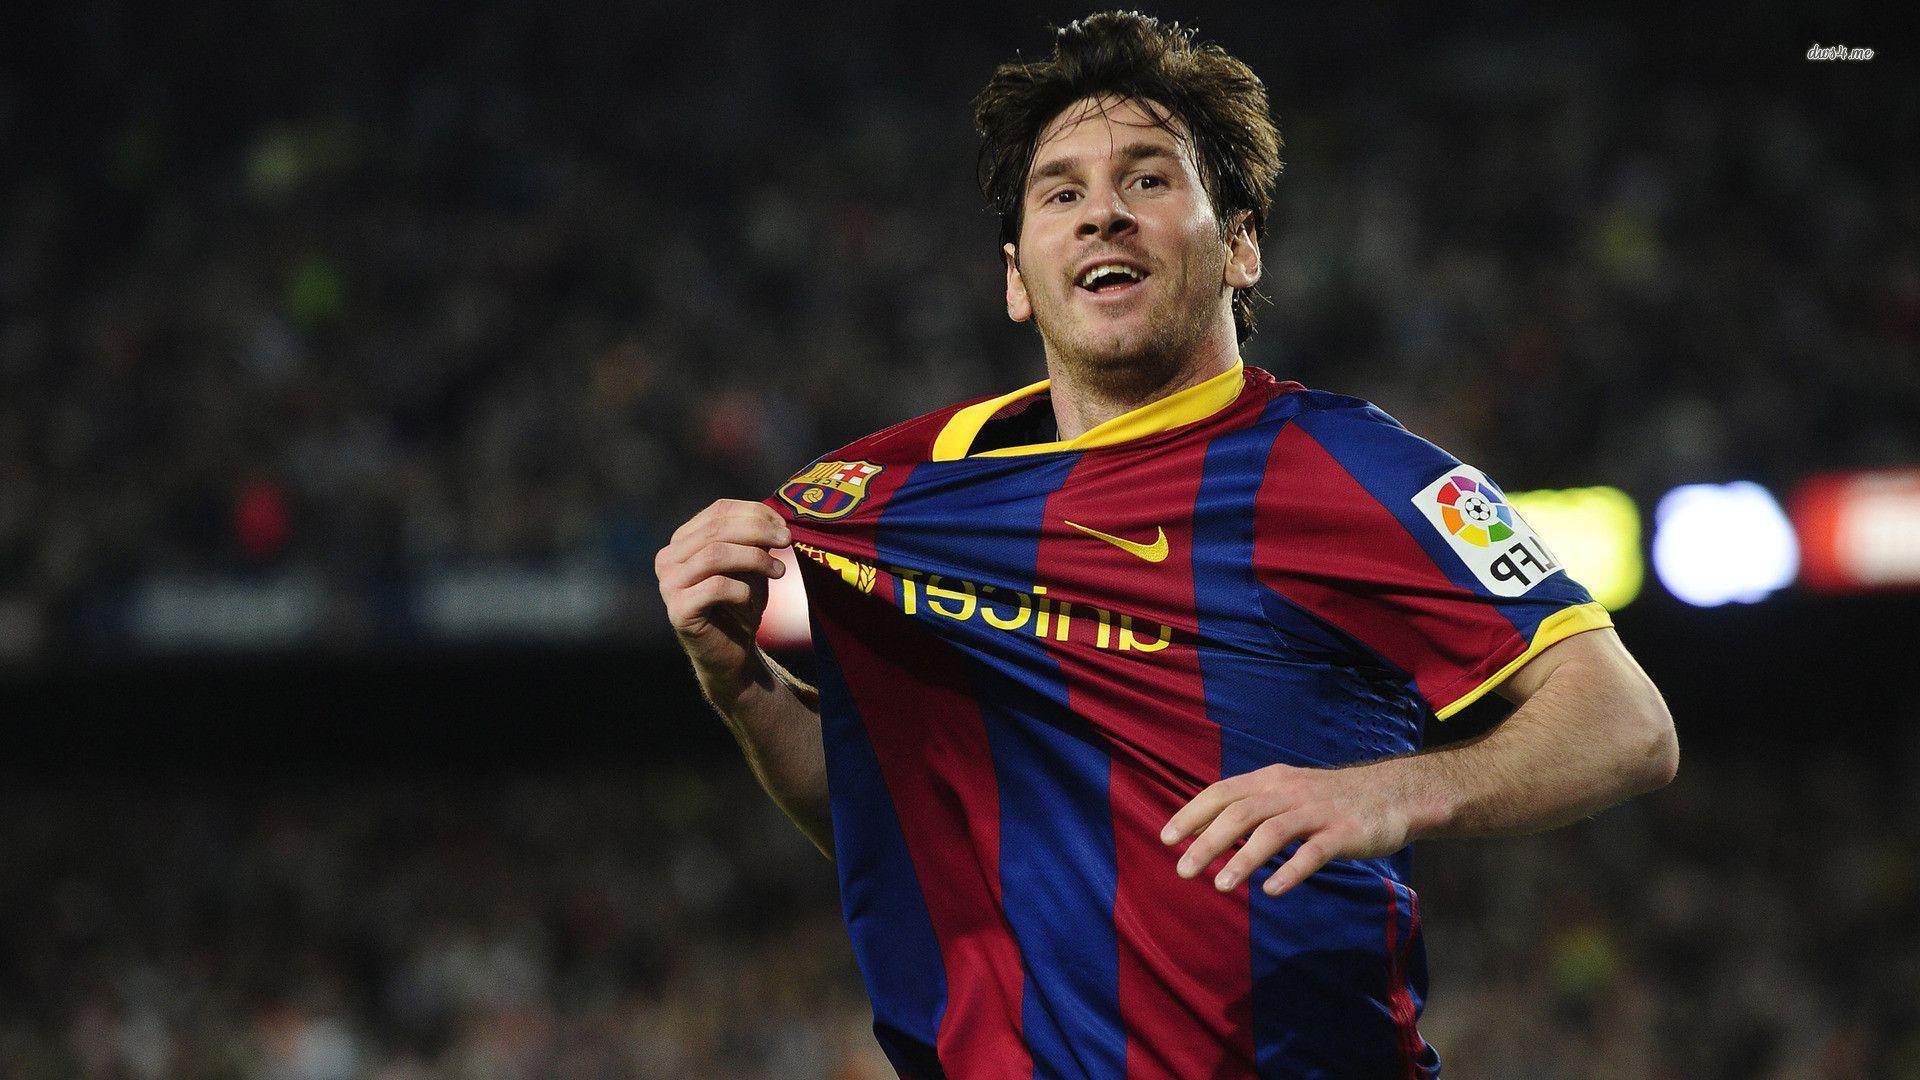 Messi Hd Wallpapers 1080p 2017 Wallpaper Cave